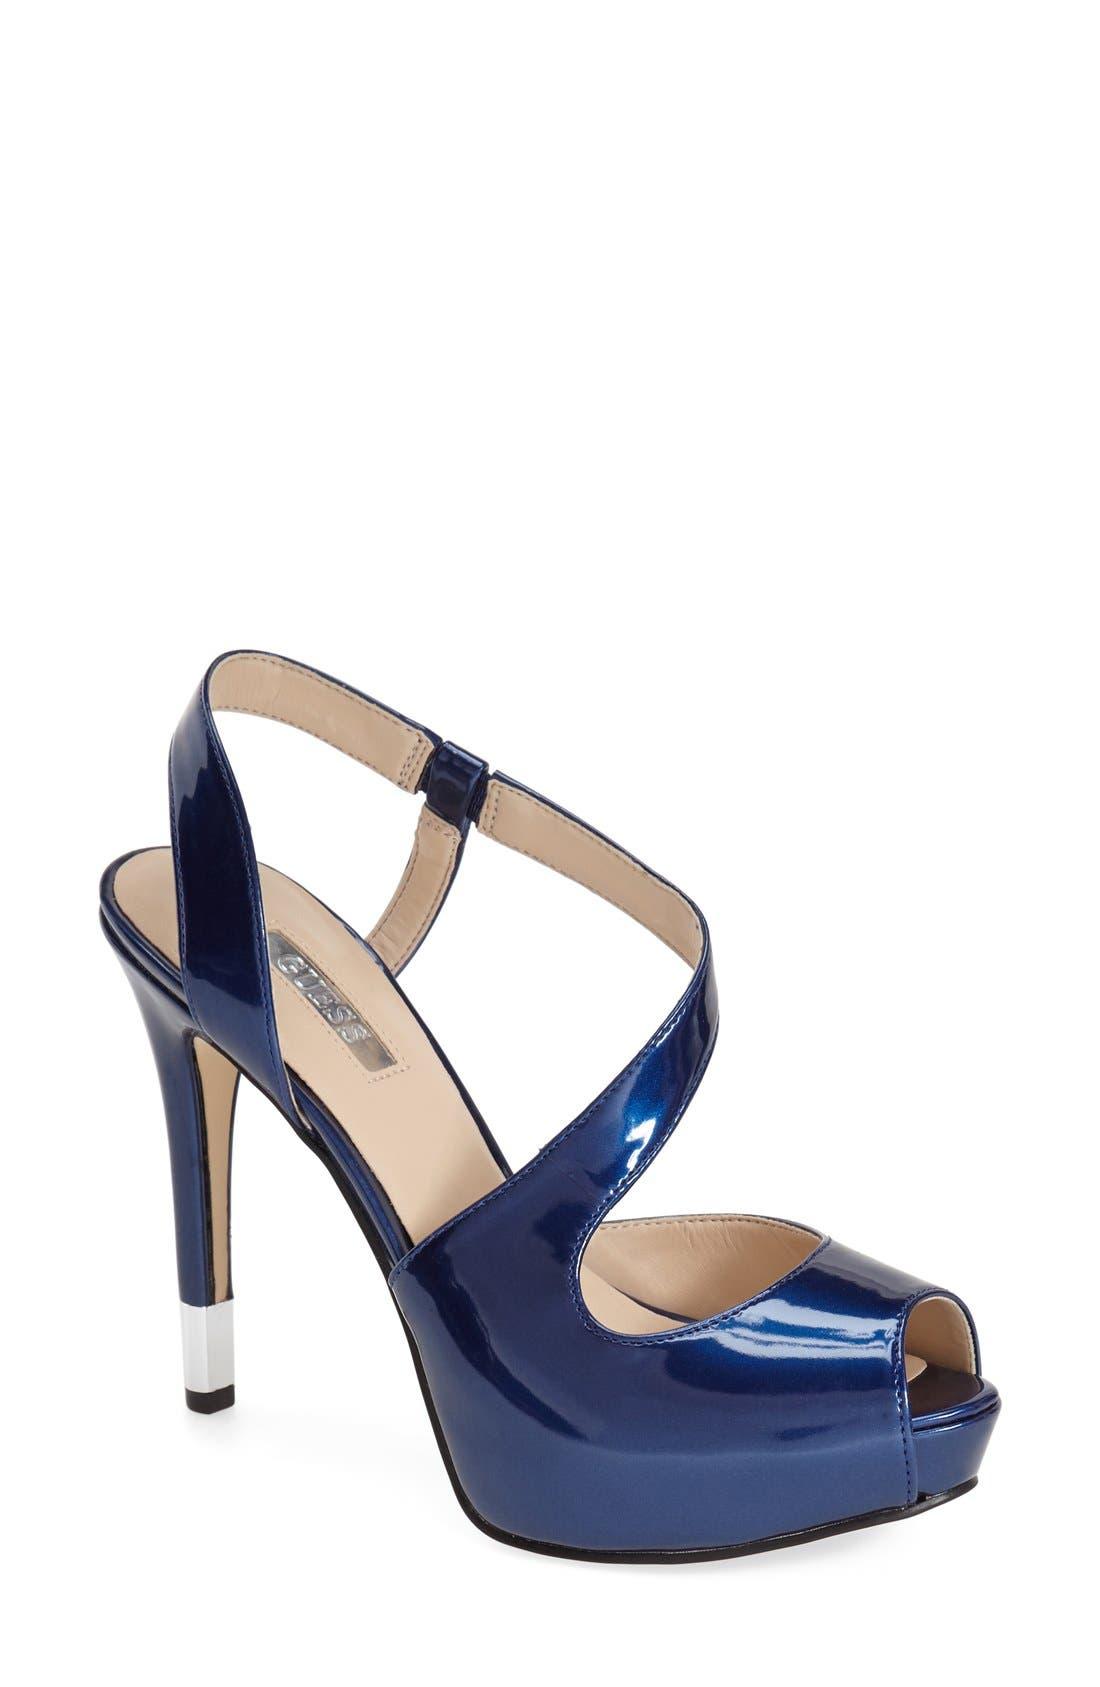 Main Image - GUESS 'Hilarie' Peep Toe Sandal (Women)